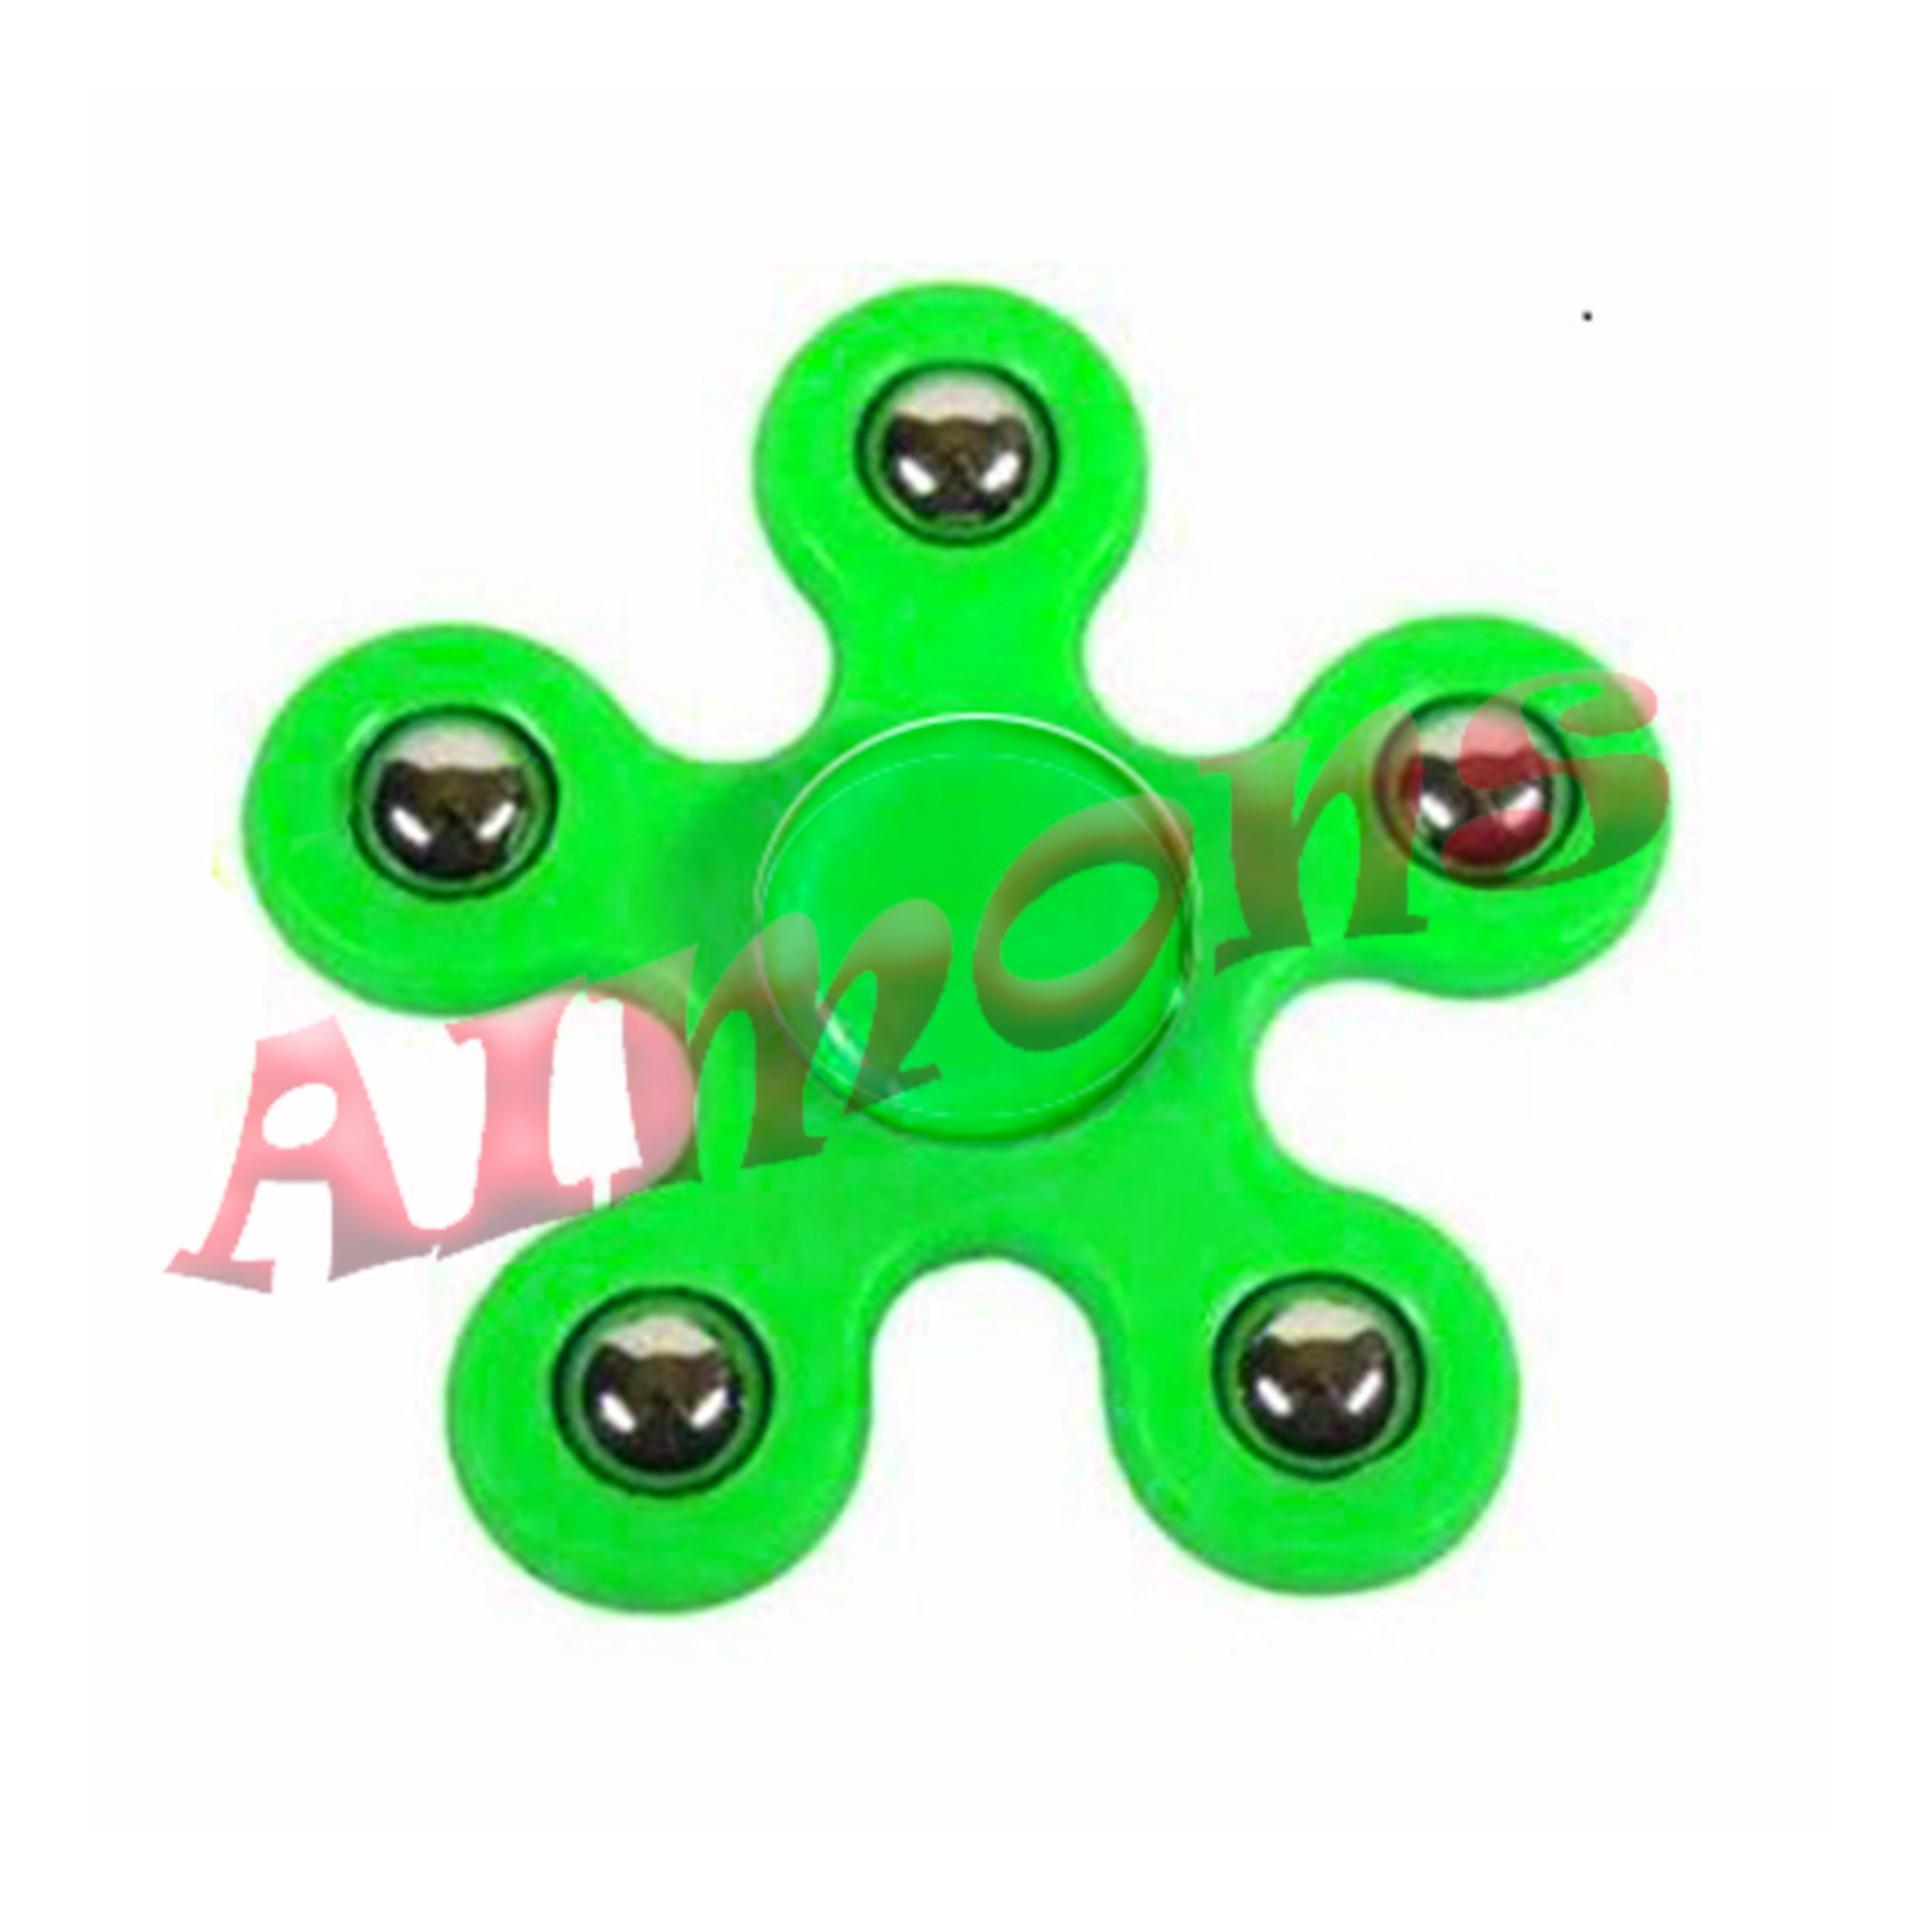 Spinner Fidget Besi Model Dollar Daftar Harga Terlengkap Full Metal Segi Tiga Sj0048 Aimons Bunga Hand Spinners Toys Mainan Melatih Focus